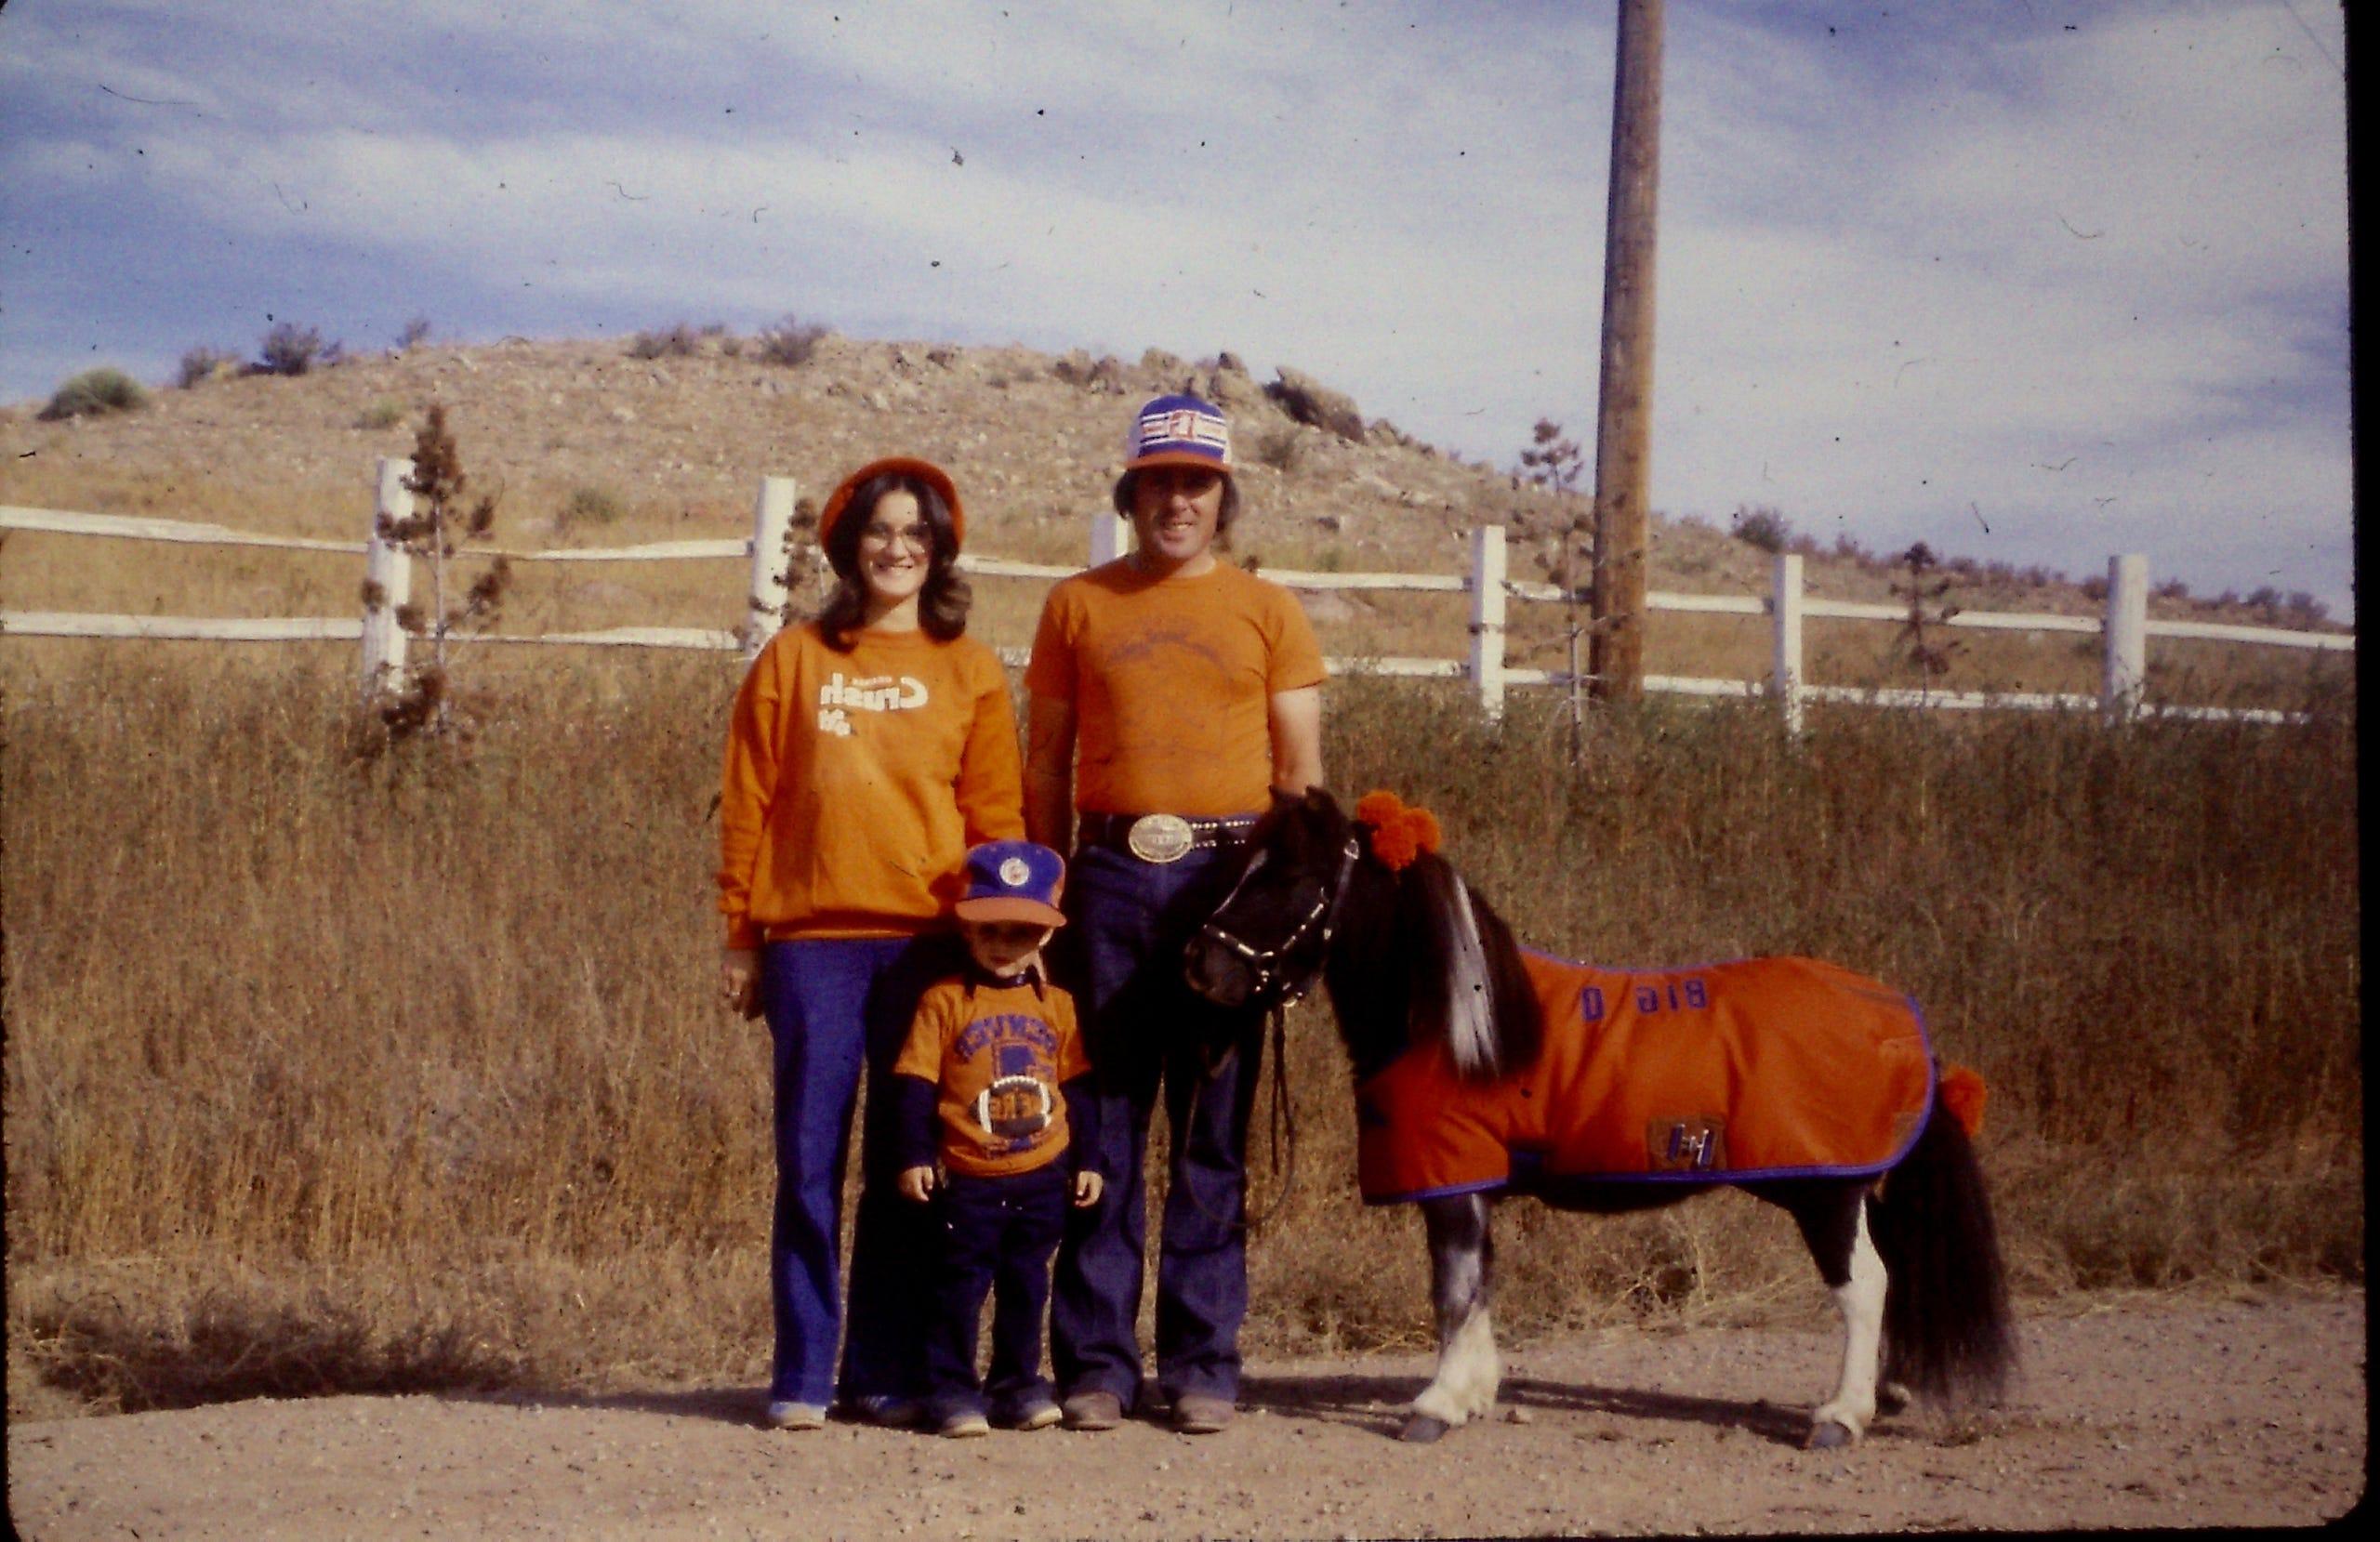 Meet The Denver Broncos First Live Mascot Td The Mini Horse